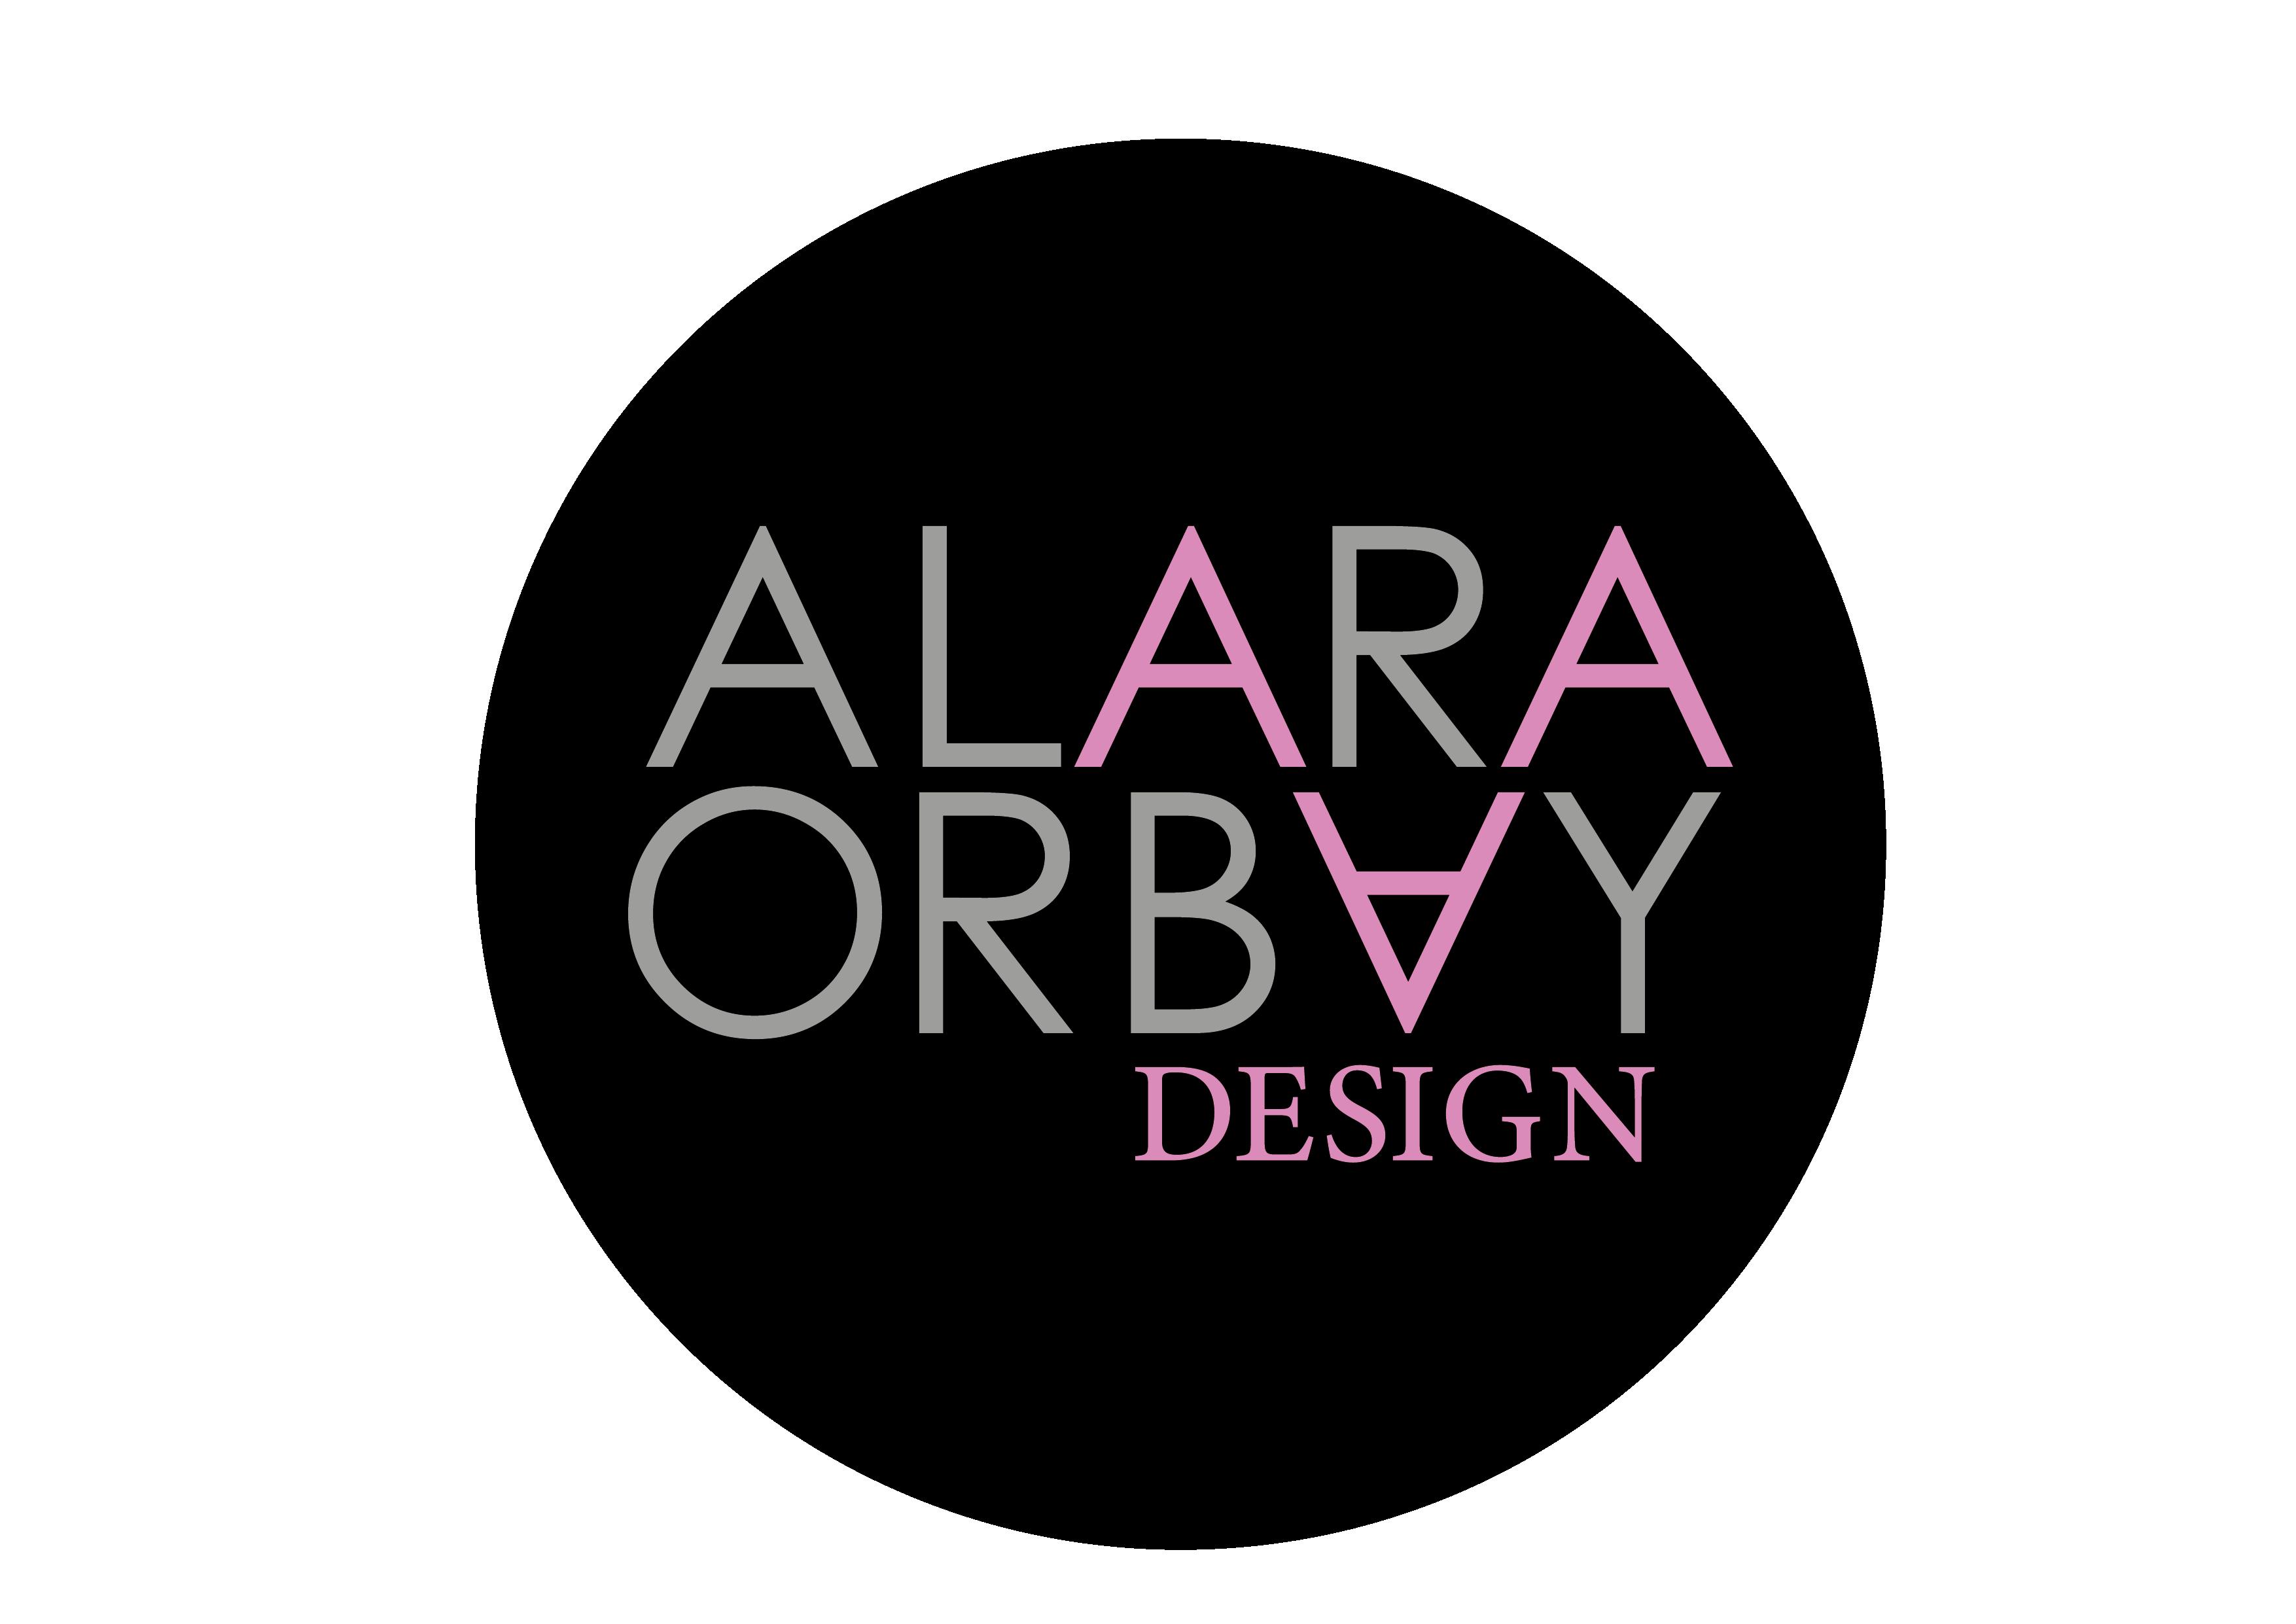 ALARA ORBAY Fashion